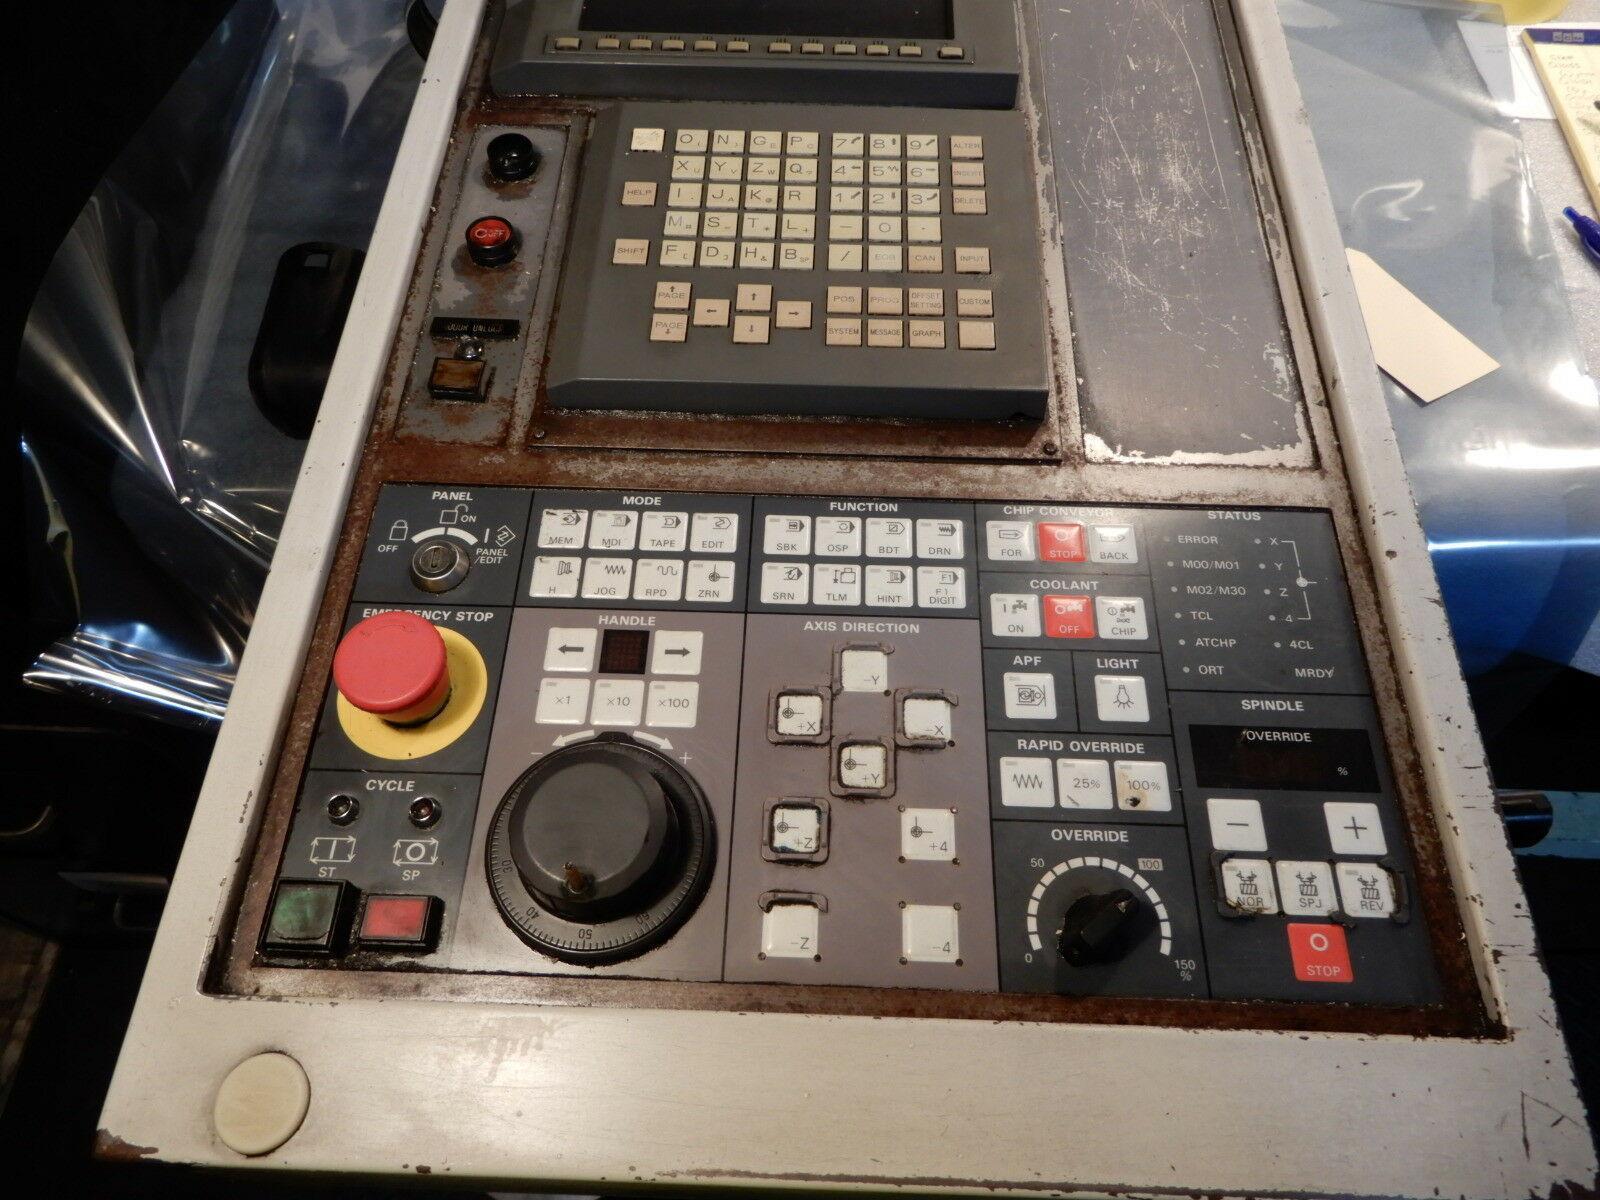 MORI SEIKI SV40 CNC OPERATORS UNIT, Model MSC 518CRT.